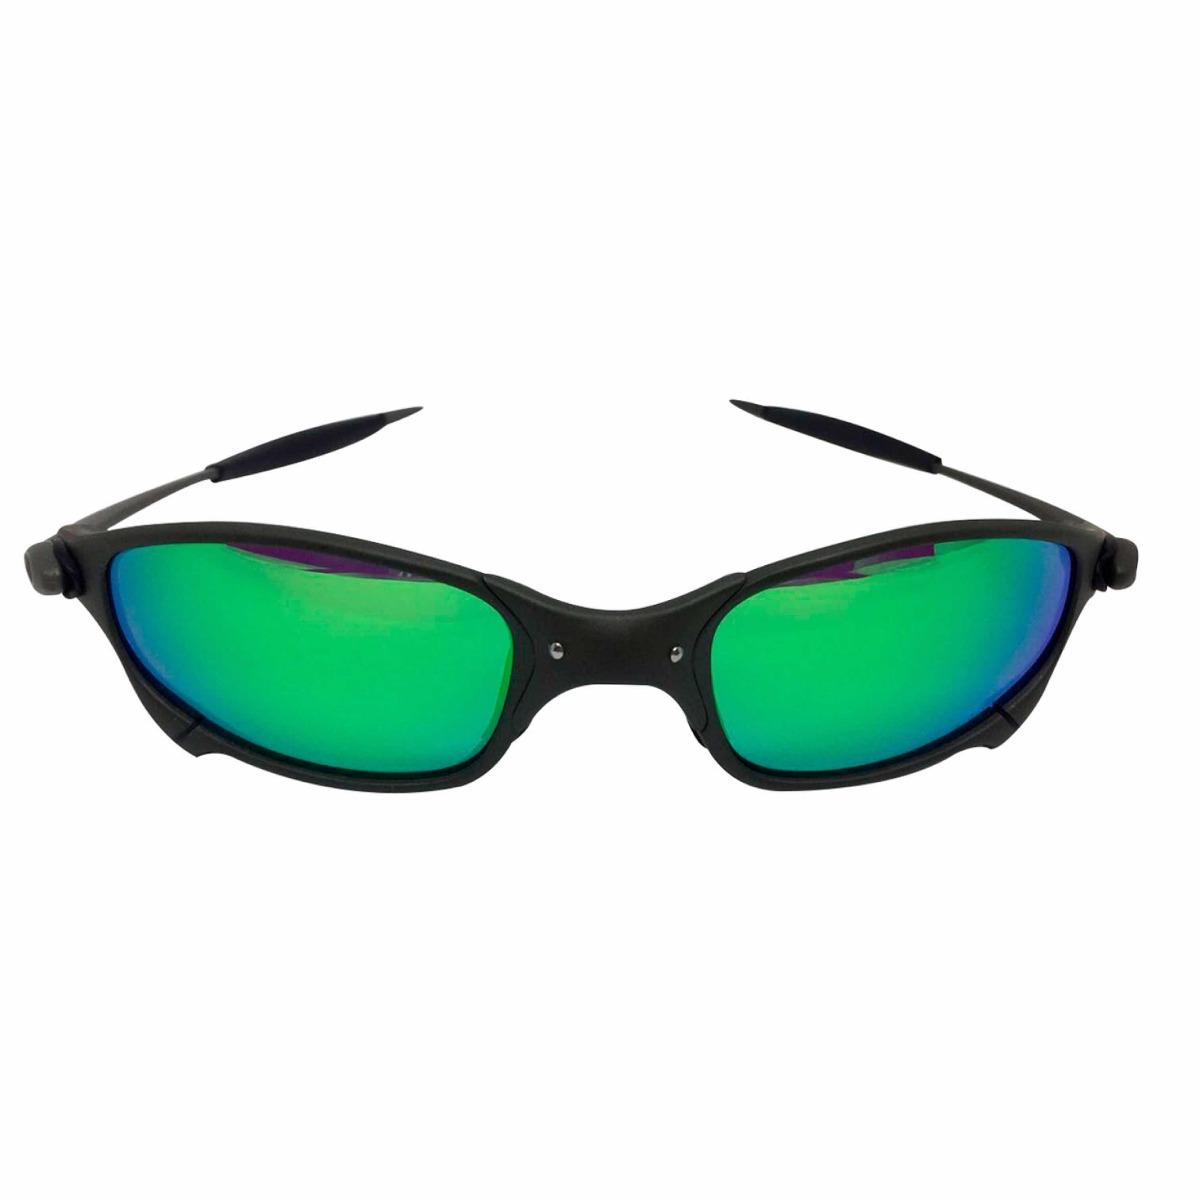 oculos oakley juliet xmetal lente verde g26 polarizadas. Carregando zoom. 219ec04d1f